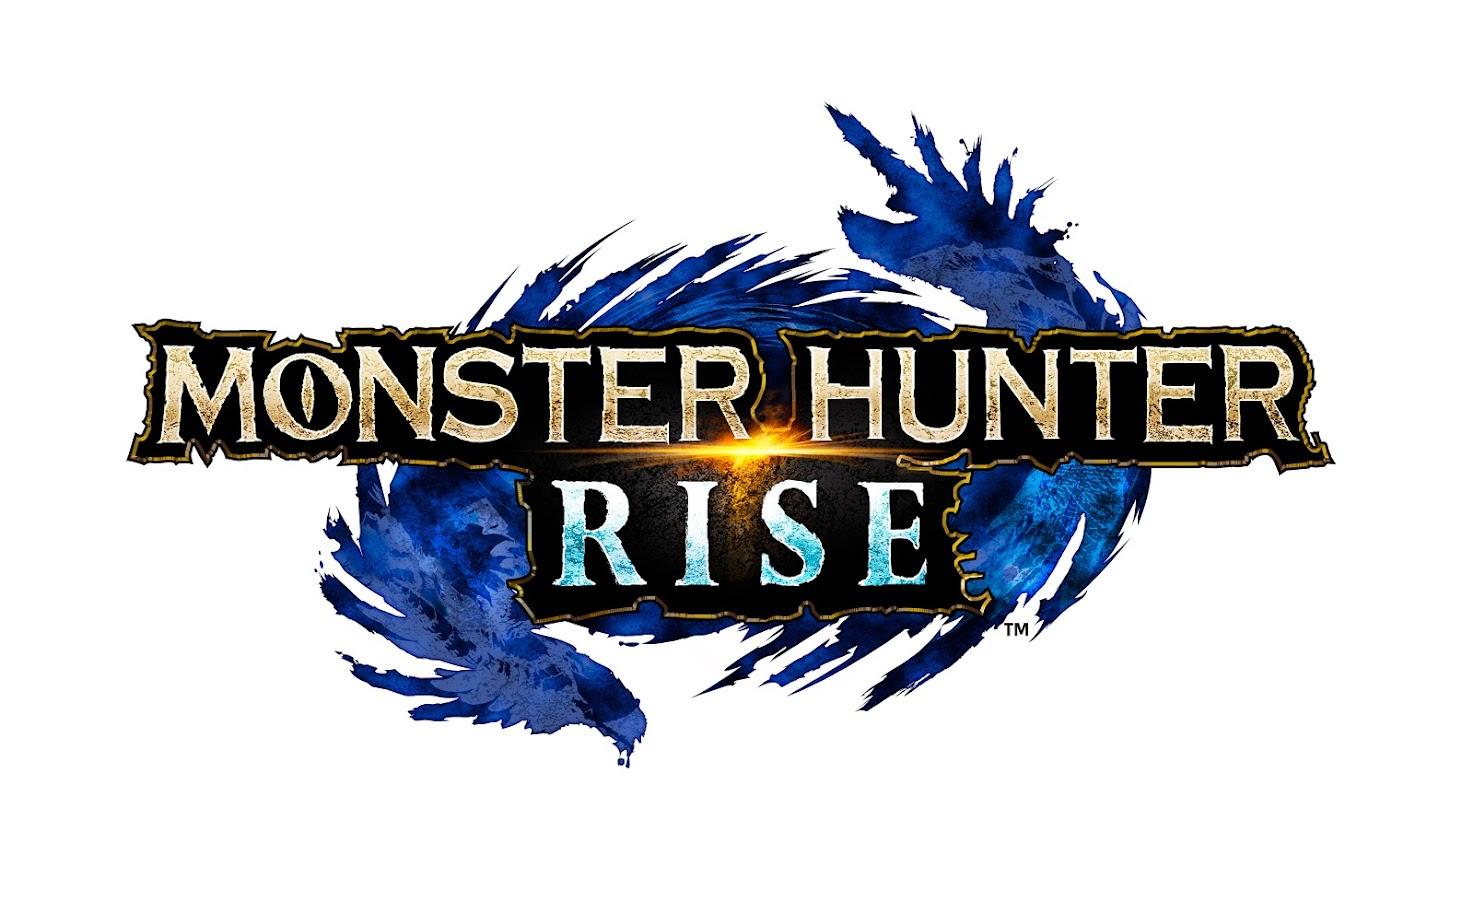 Monster Hunter Rise ล่ามอนฯ ในบรรยากาศแบบญี่ปุ่น